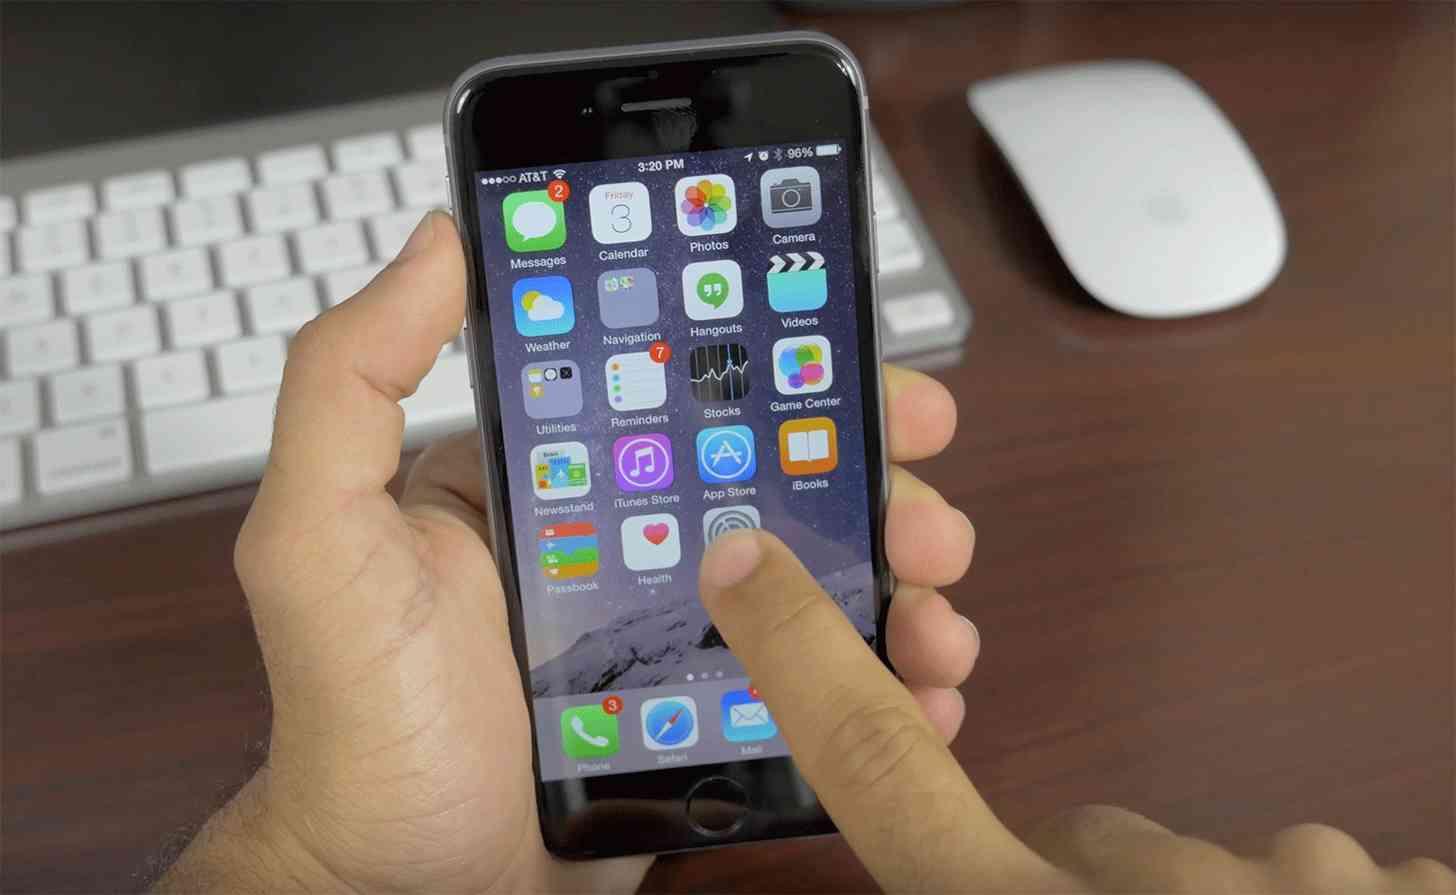 iPhone 6 preinstalled Apple apps